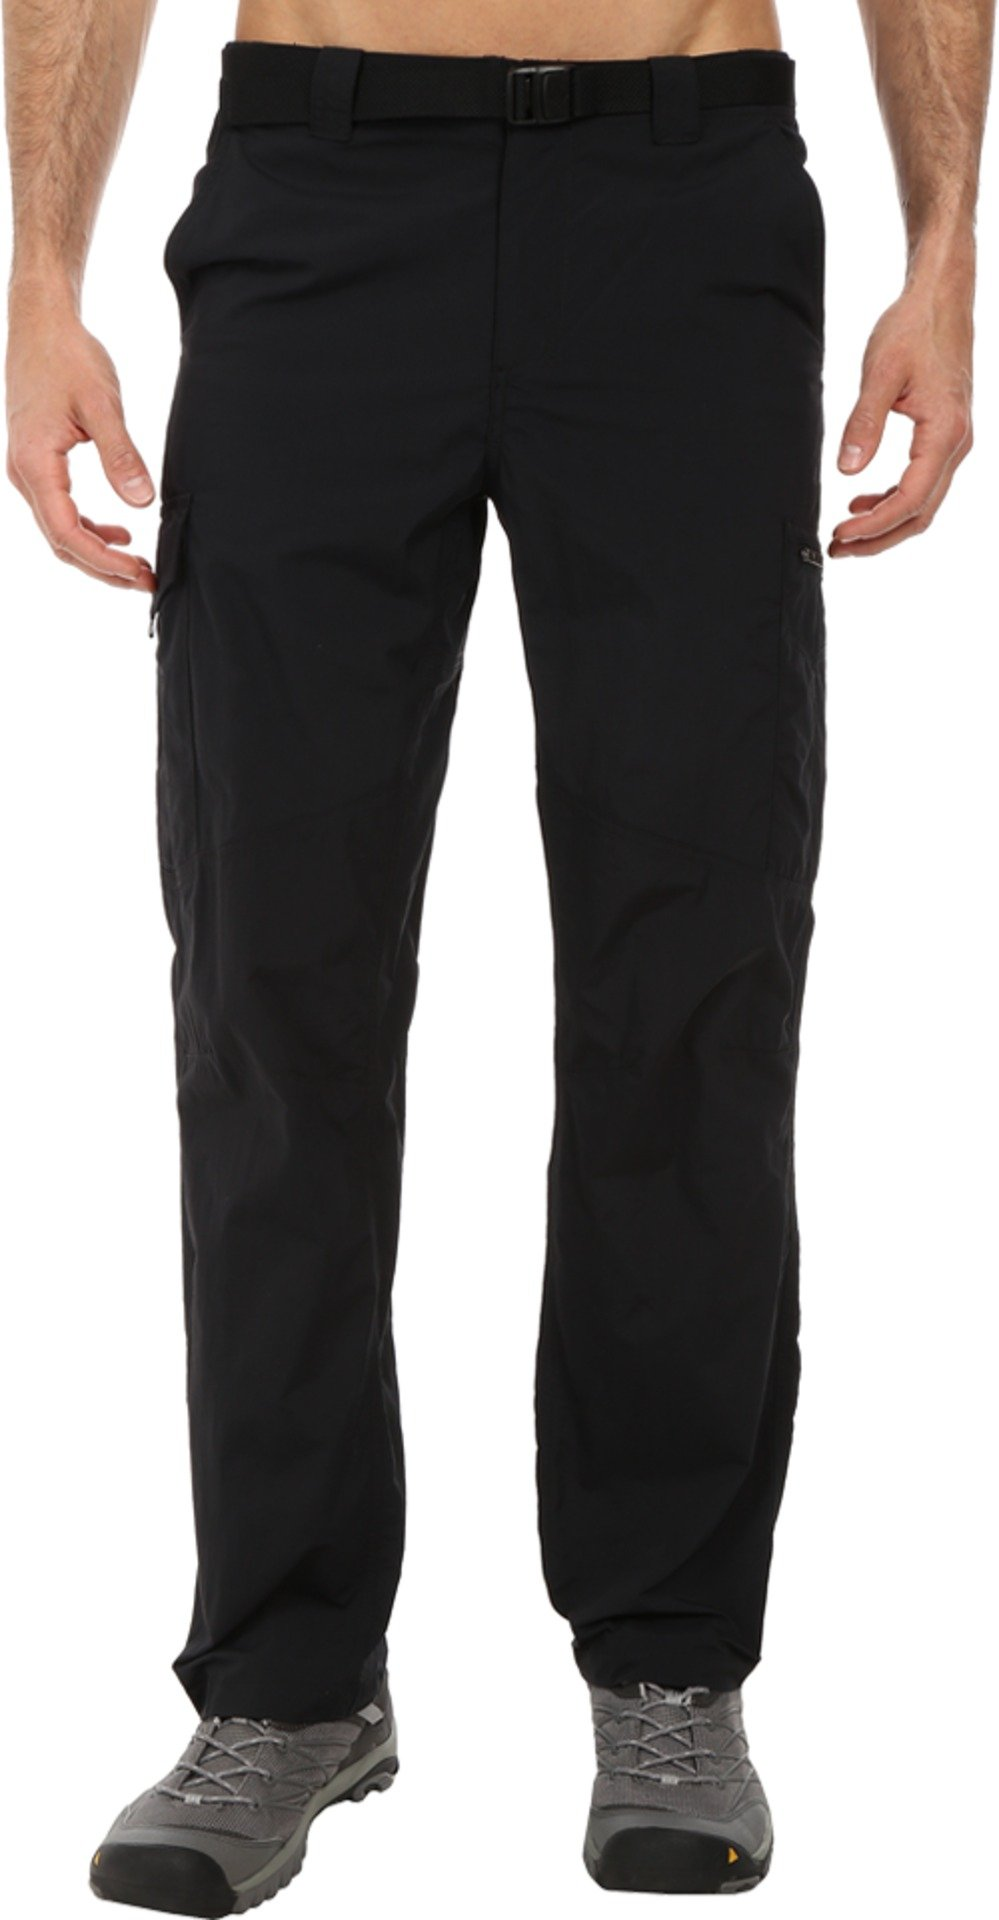 Columbia Silver Ridge Cargo Pant, Black, 30 x 30